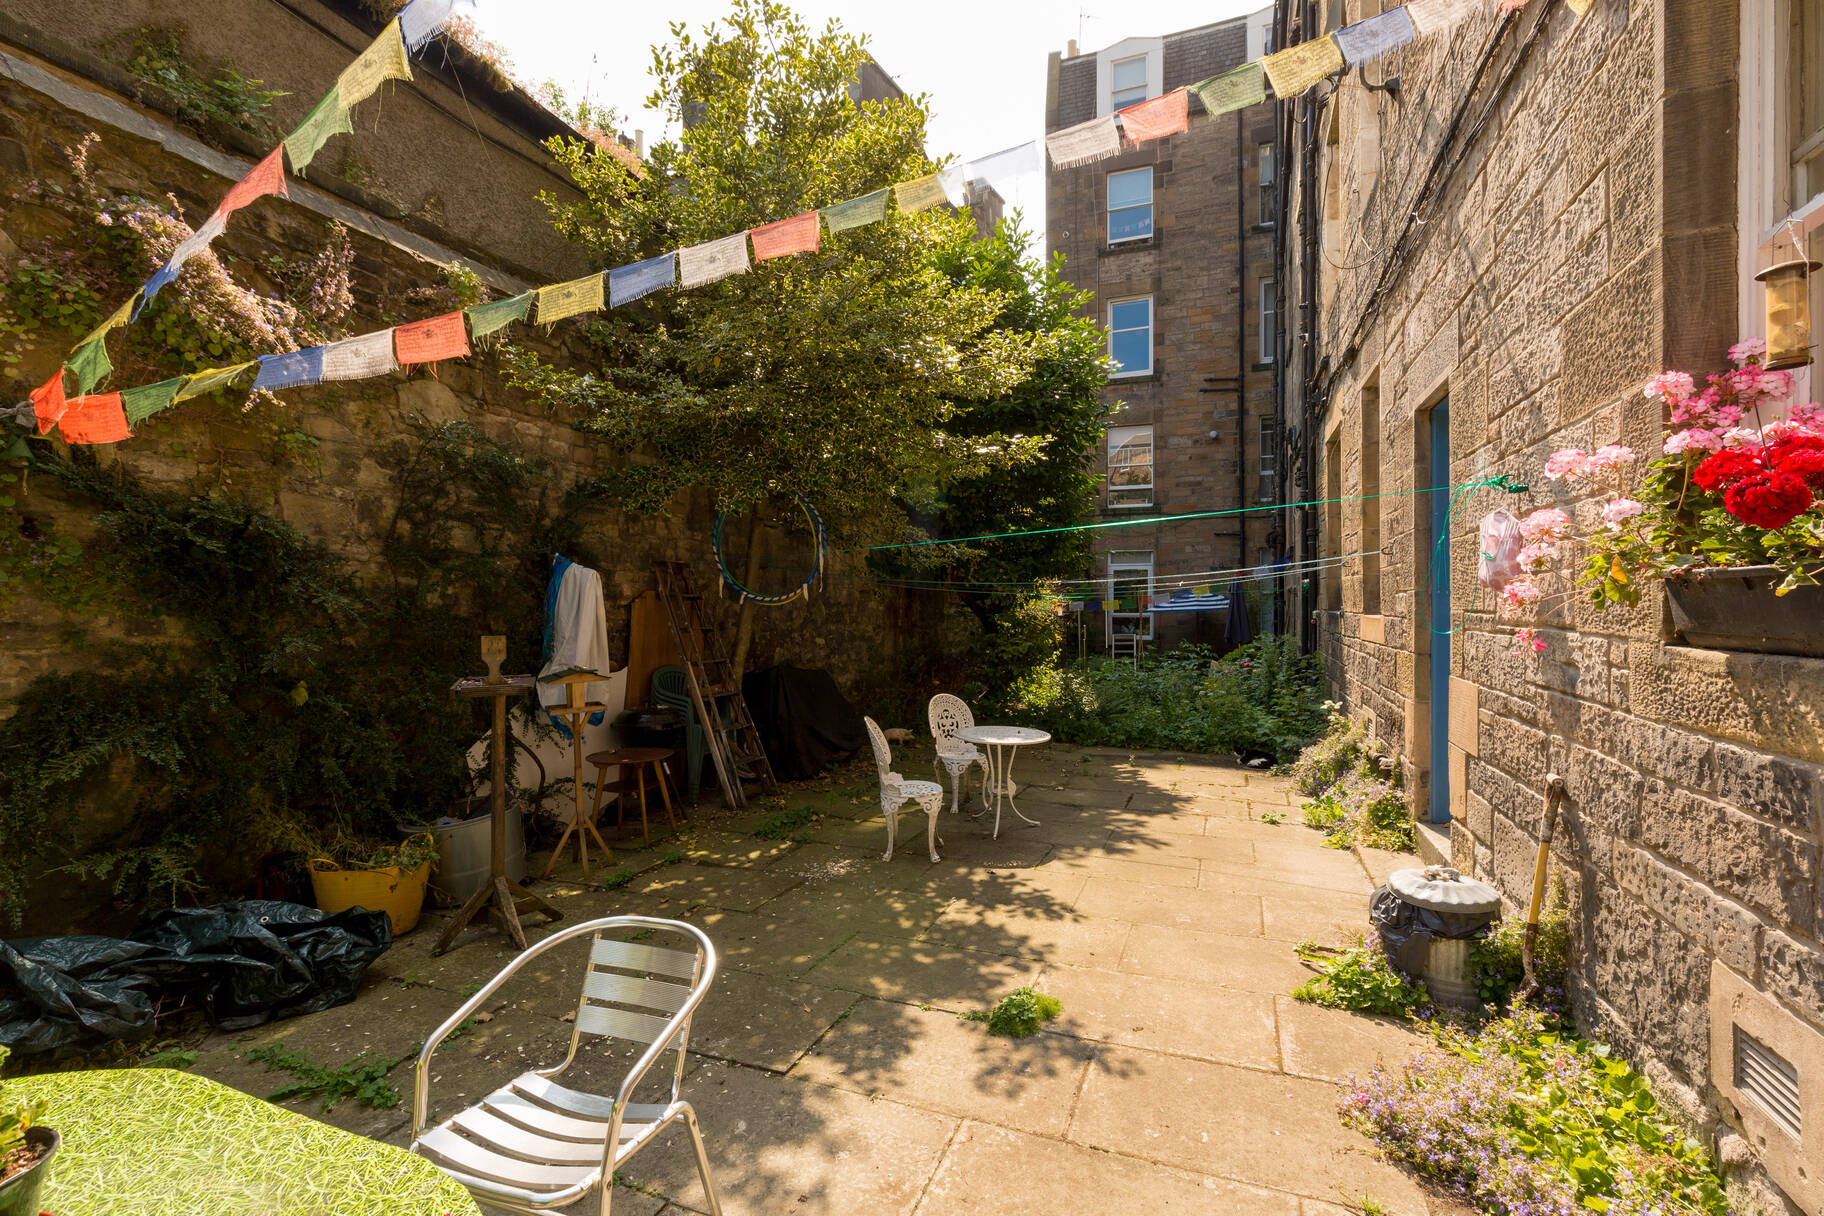 3/7 Buccleuch Terrace, Edinburgh, EH8 9NB